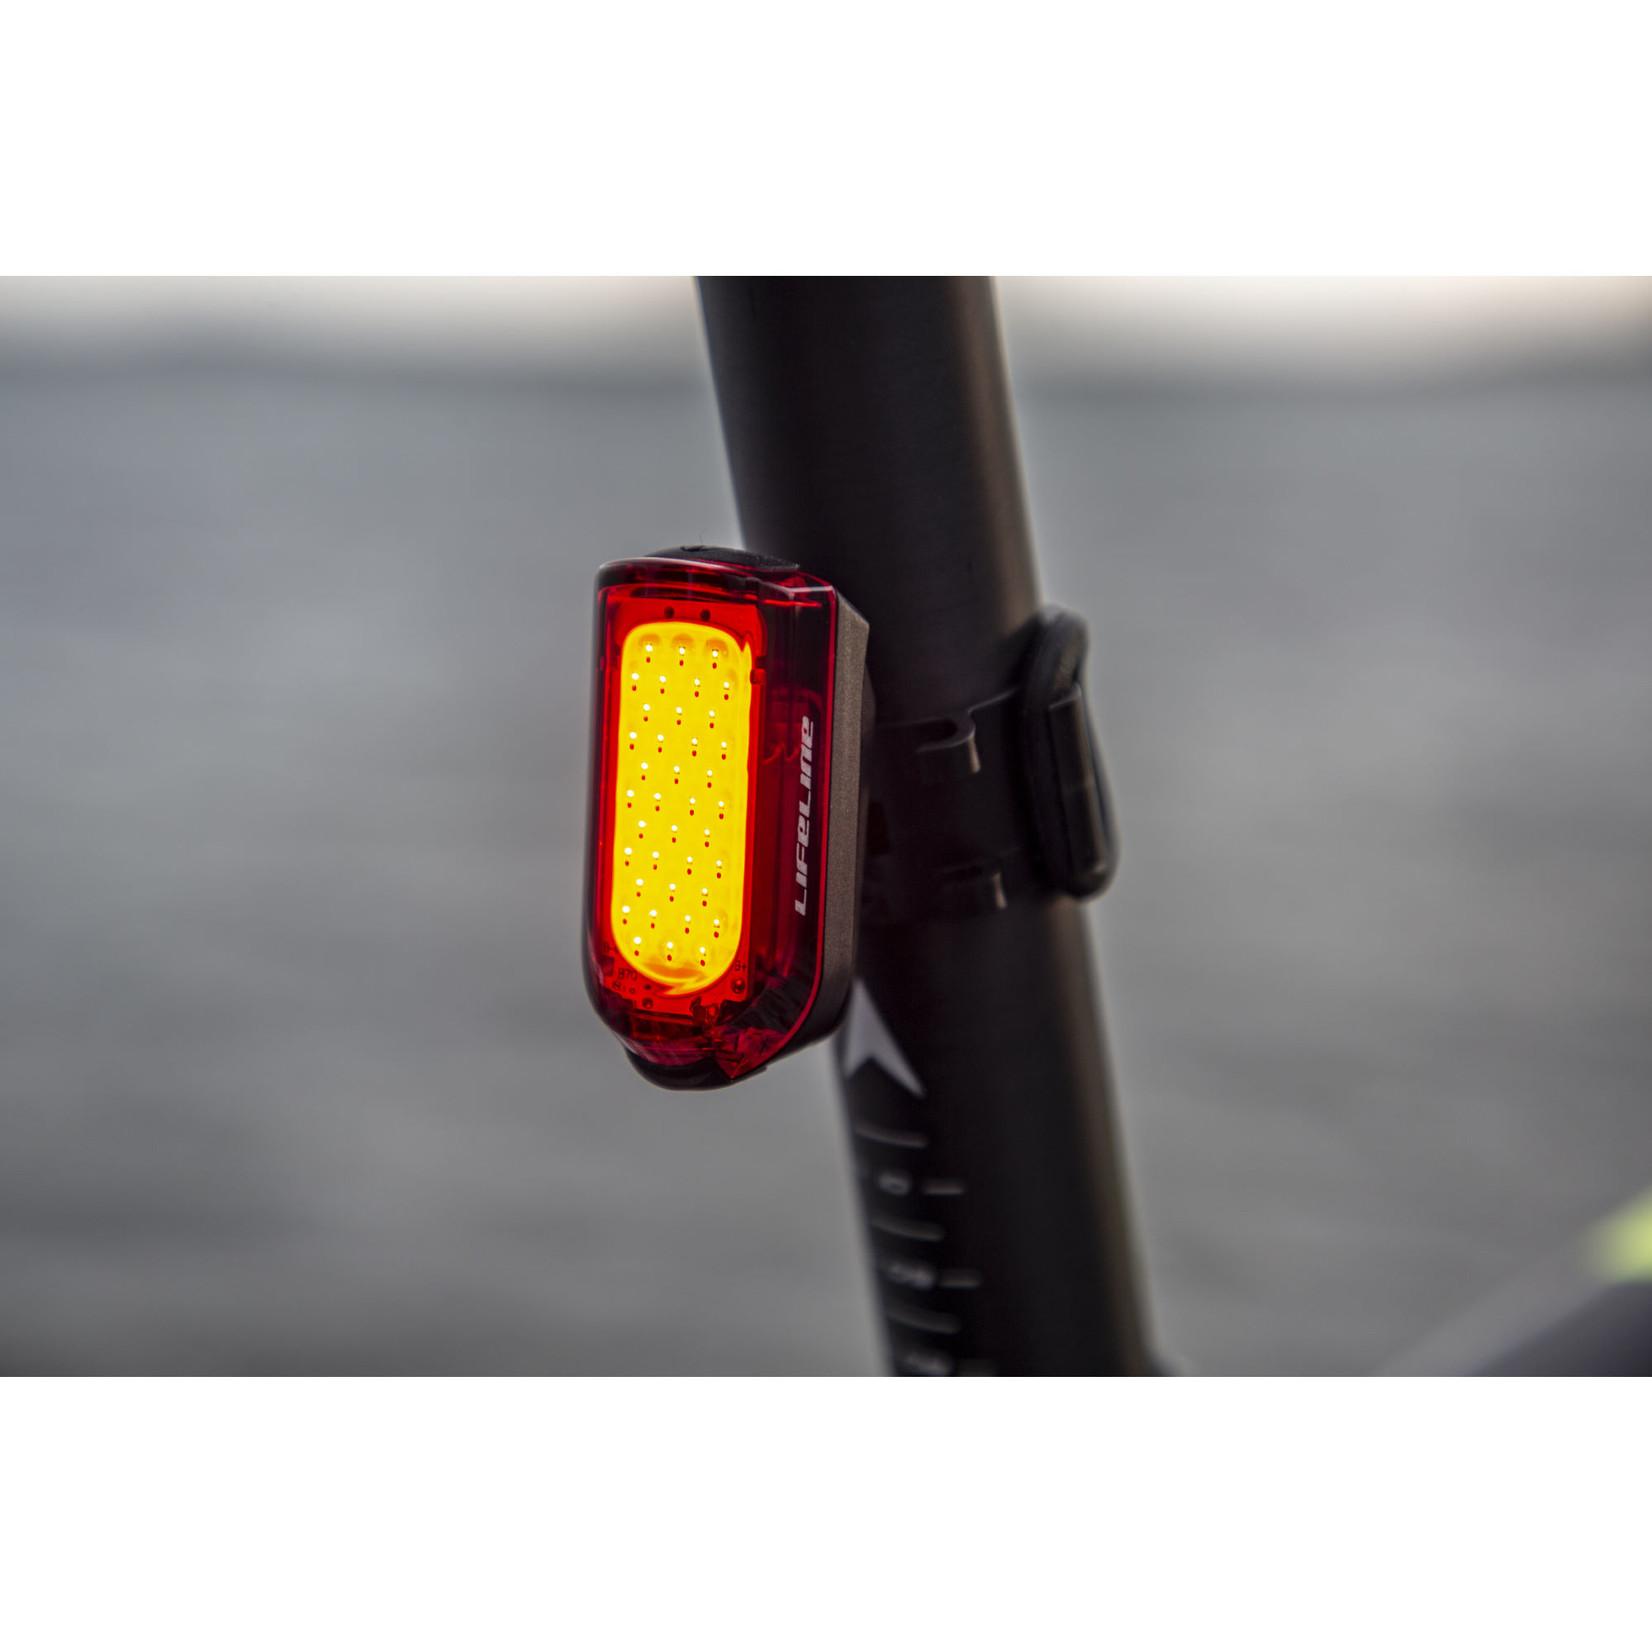 LifeLine Daylight Visible 20 Lumen Rear Bike Light